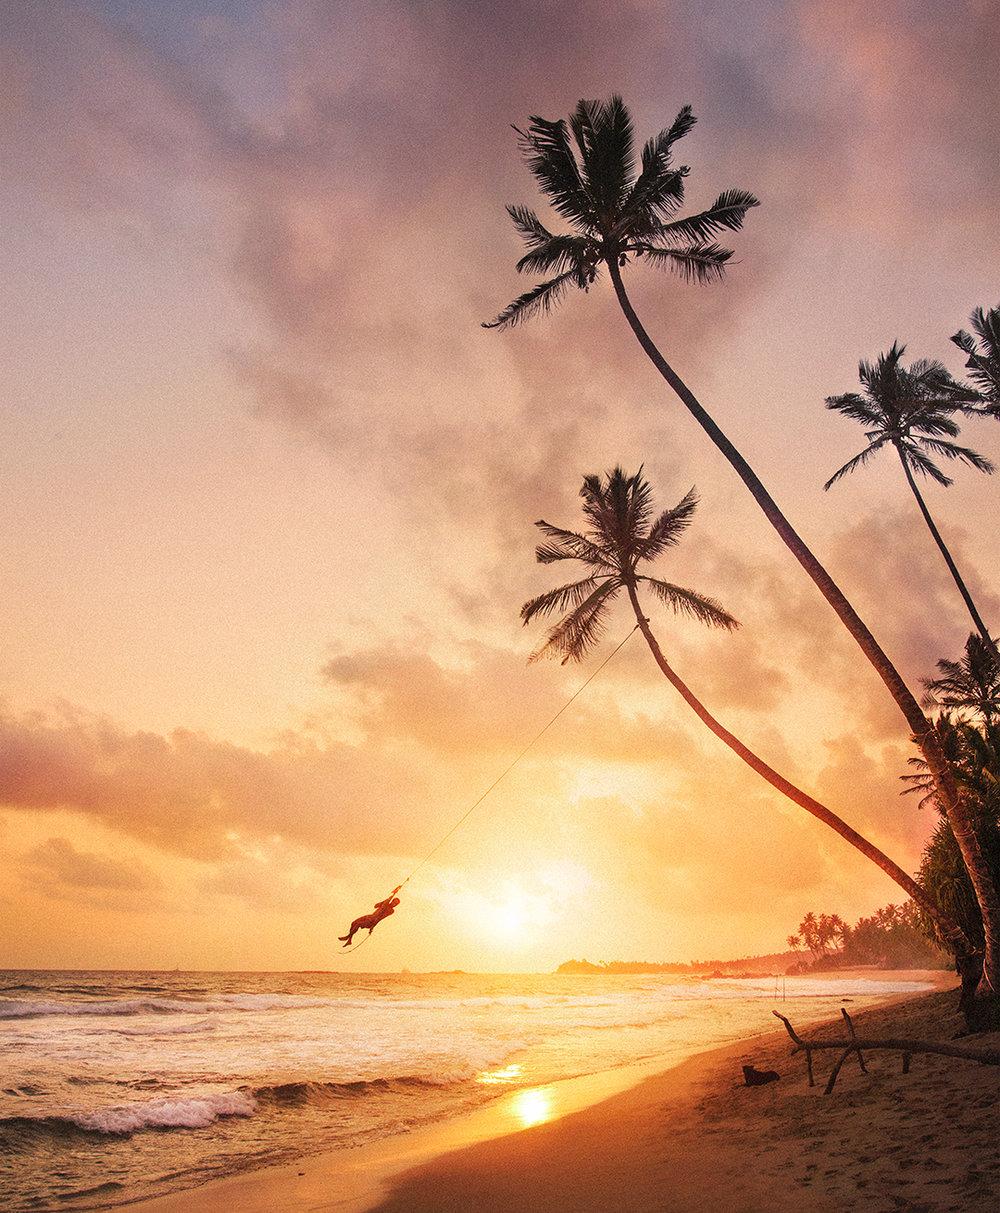 Swing_SriLanka.jpg